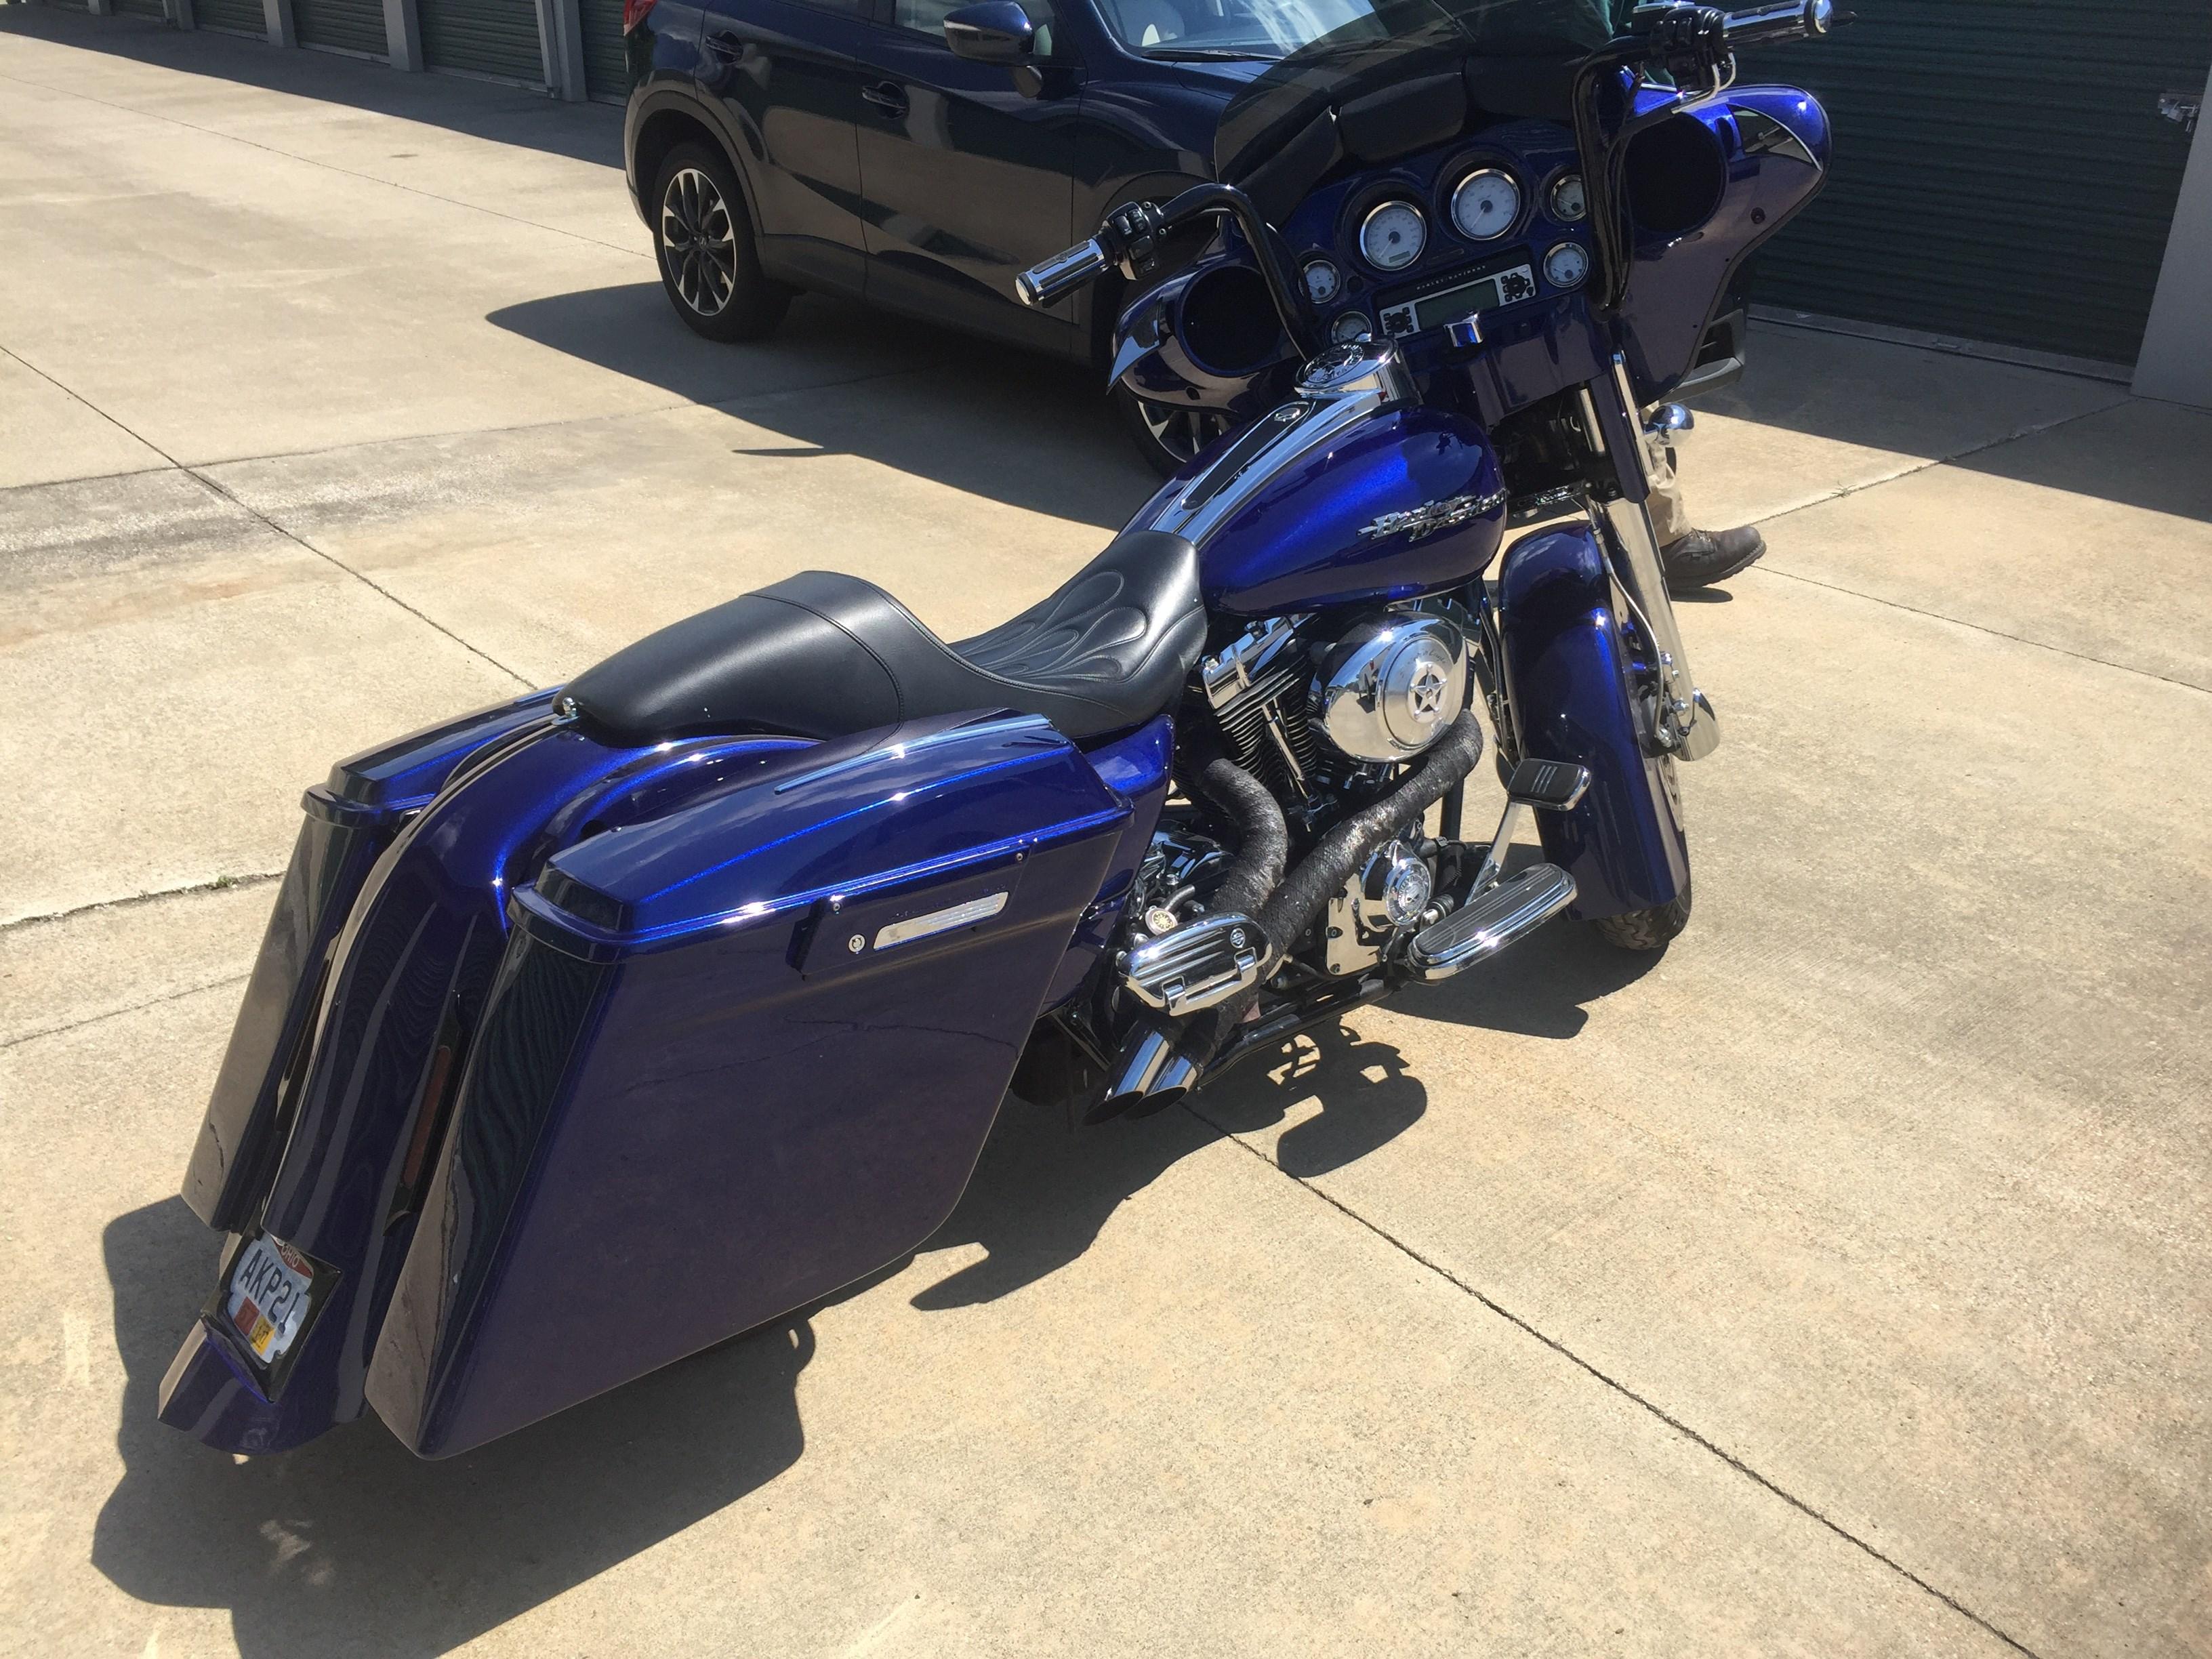 Harley Davidson Chico Ca >> 2006 Harley-Davidson® FLHX/I Street Glide® (Deep Cobalt Blue Pearl), Streetsboro, Ohio (730978 ...